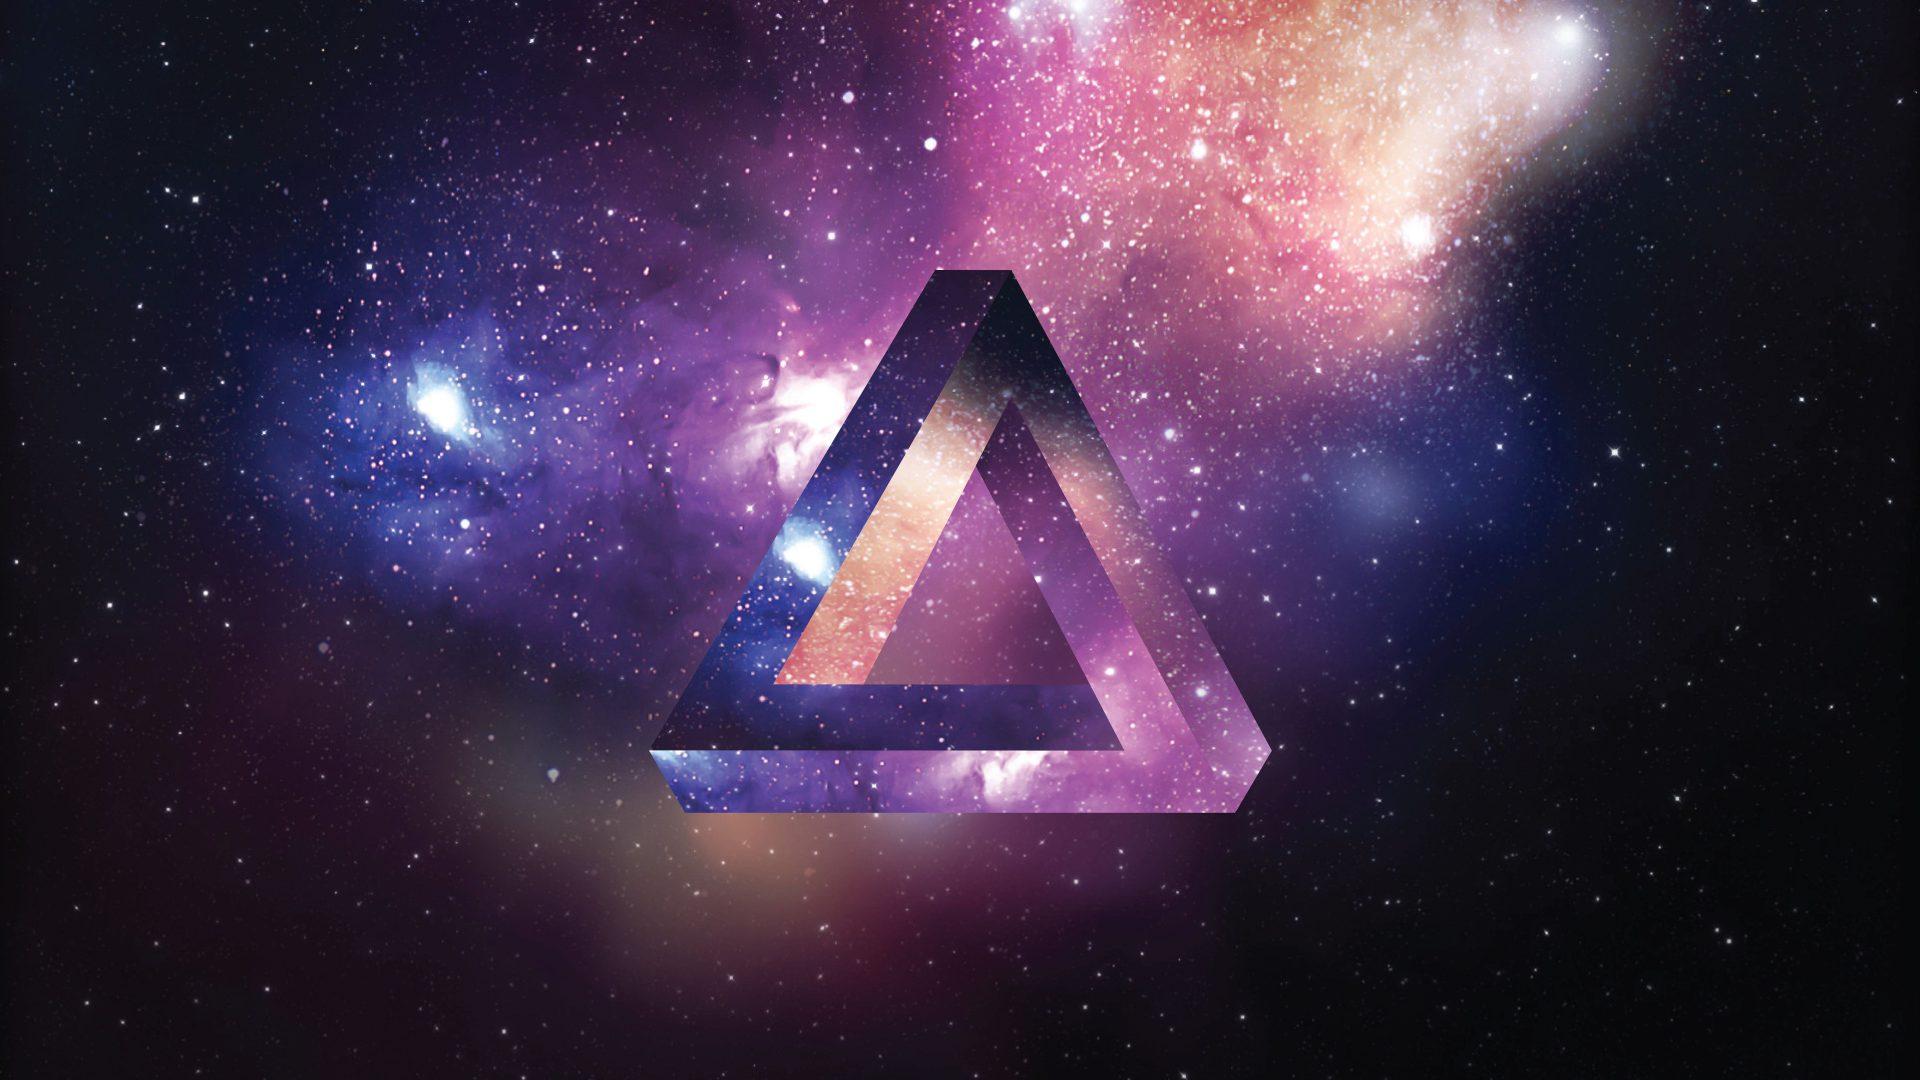 Space Triangle 8k Uhd Wallpaper